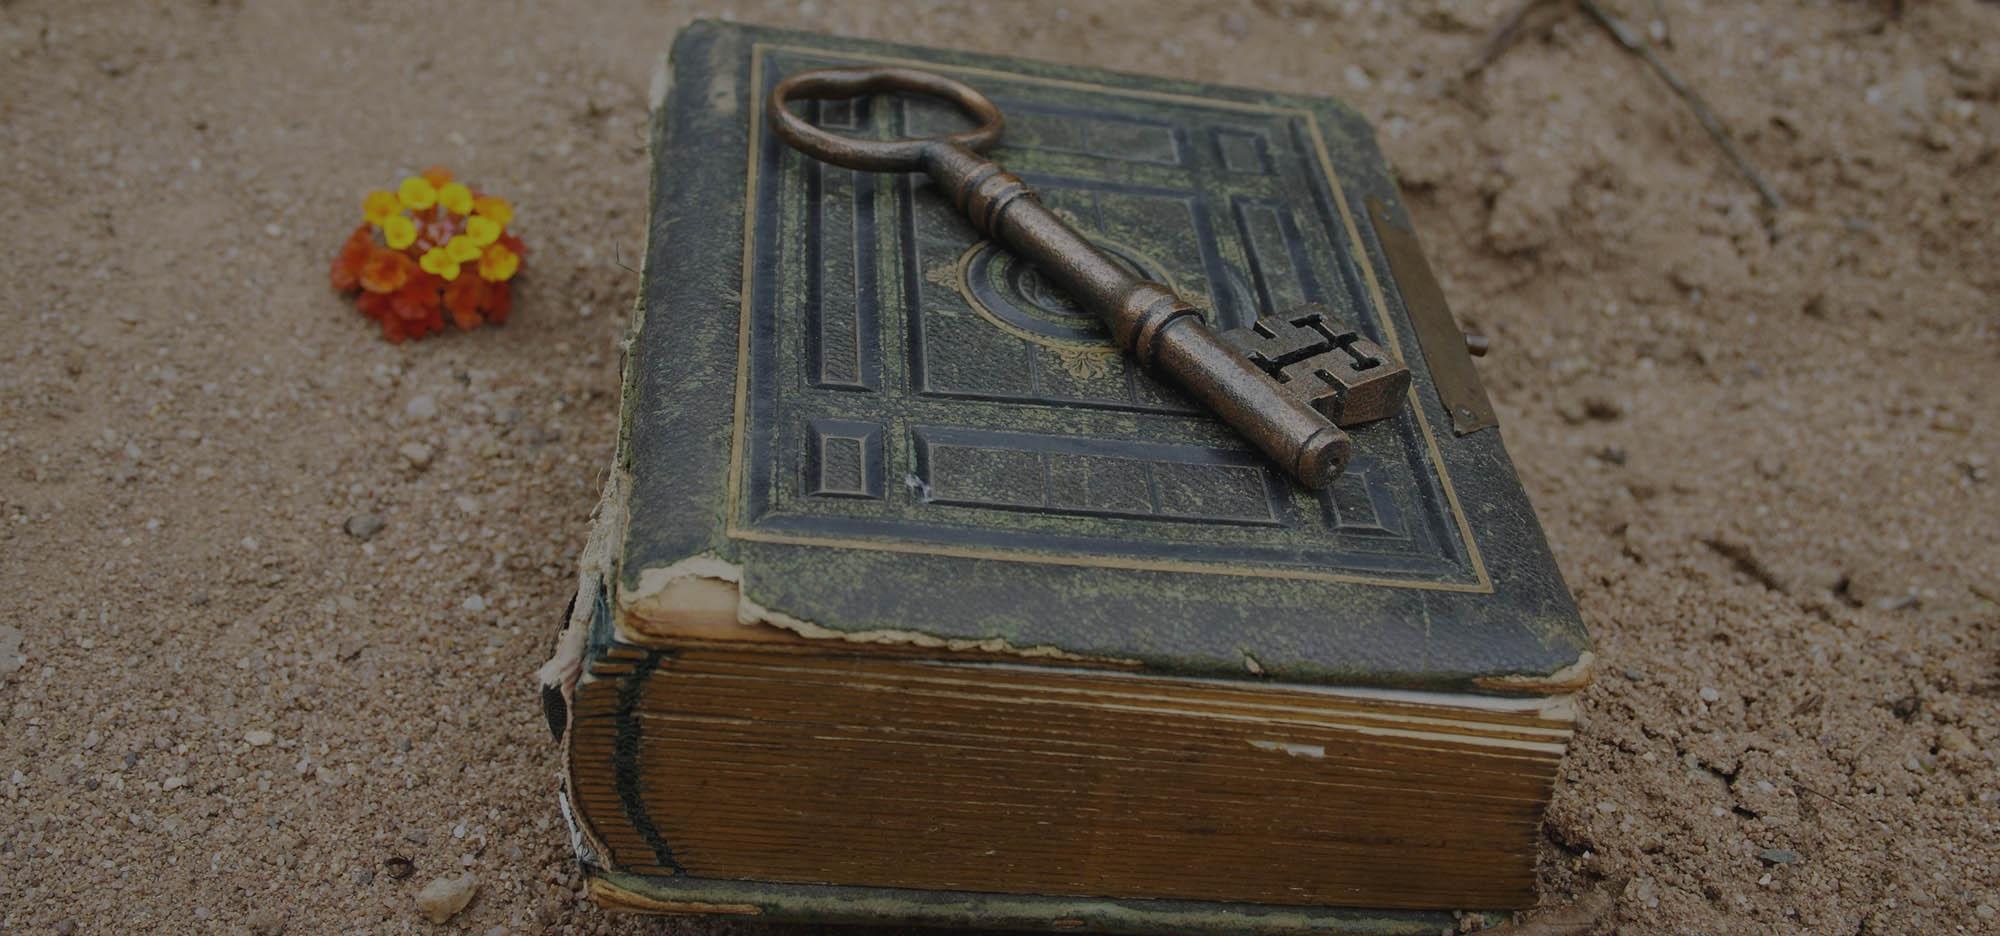 UNLOCK THE WISDOM OF THE AKASHIC RECORDS